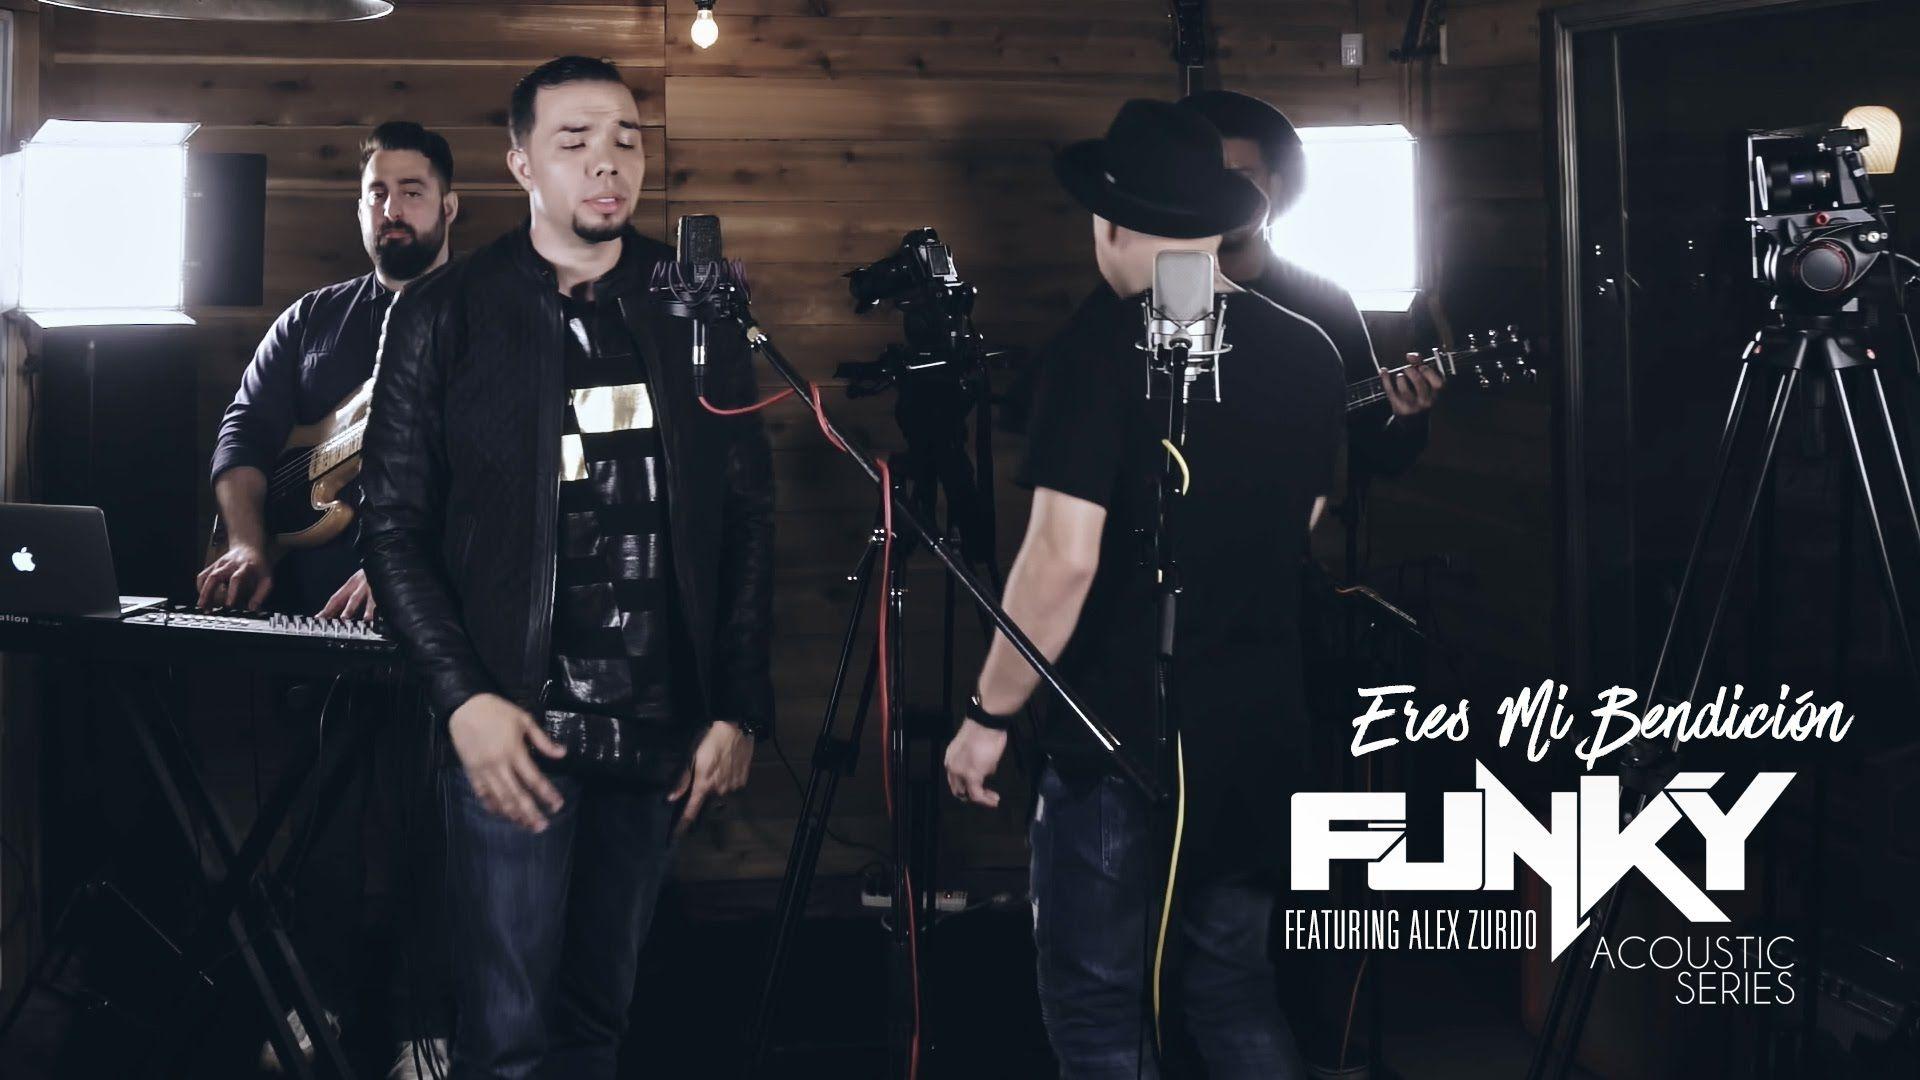 Funky Eres Mi Bendición Featuring Alex Zurdo Acoustic Series Alex Zurdo Musica Cristiana Musica